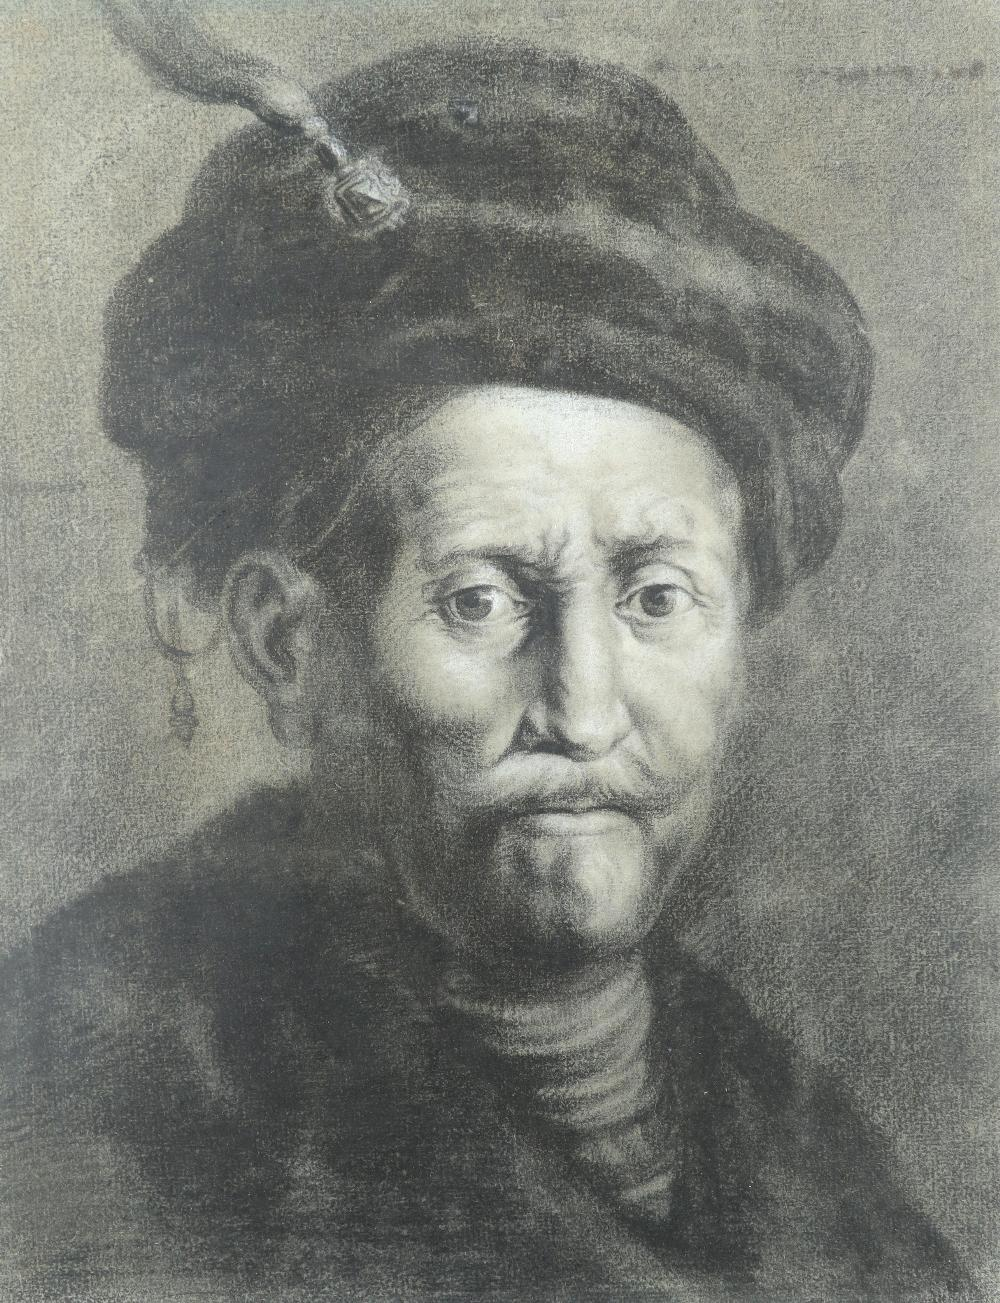 Thomas Worlidge (1700-1766) after Rembrandt van Rijn (Dutch 1606-1669) Bust of a man in a turban